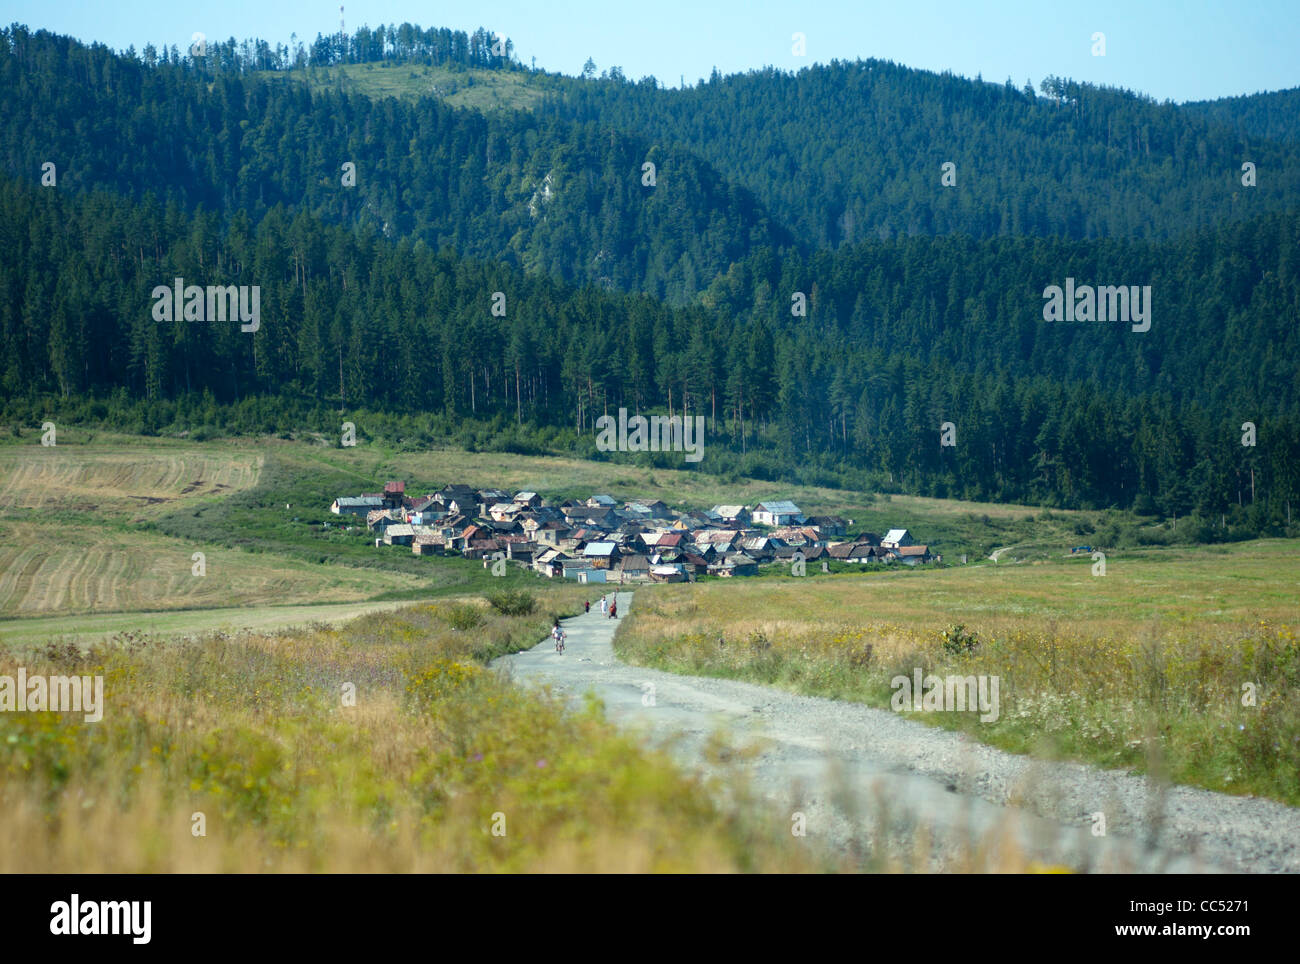 A Gypsy or Roma village on the northern side of the Slovensky Raj National Park near Letanovce slovakia - Stock Image